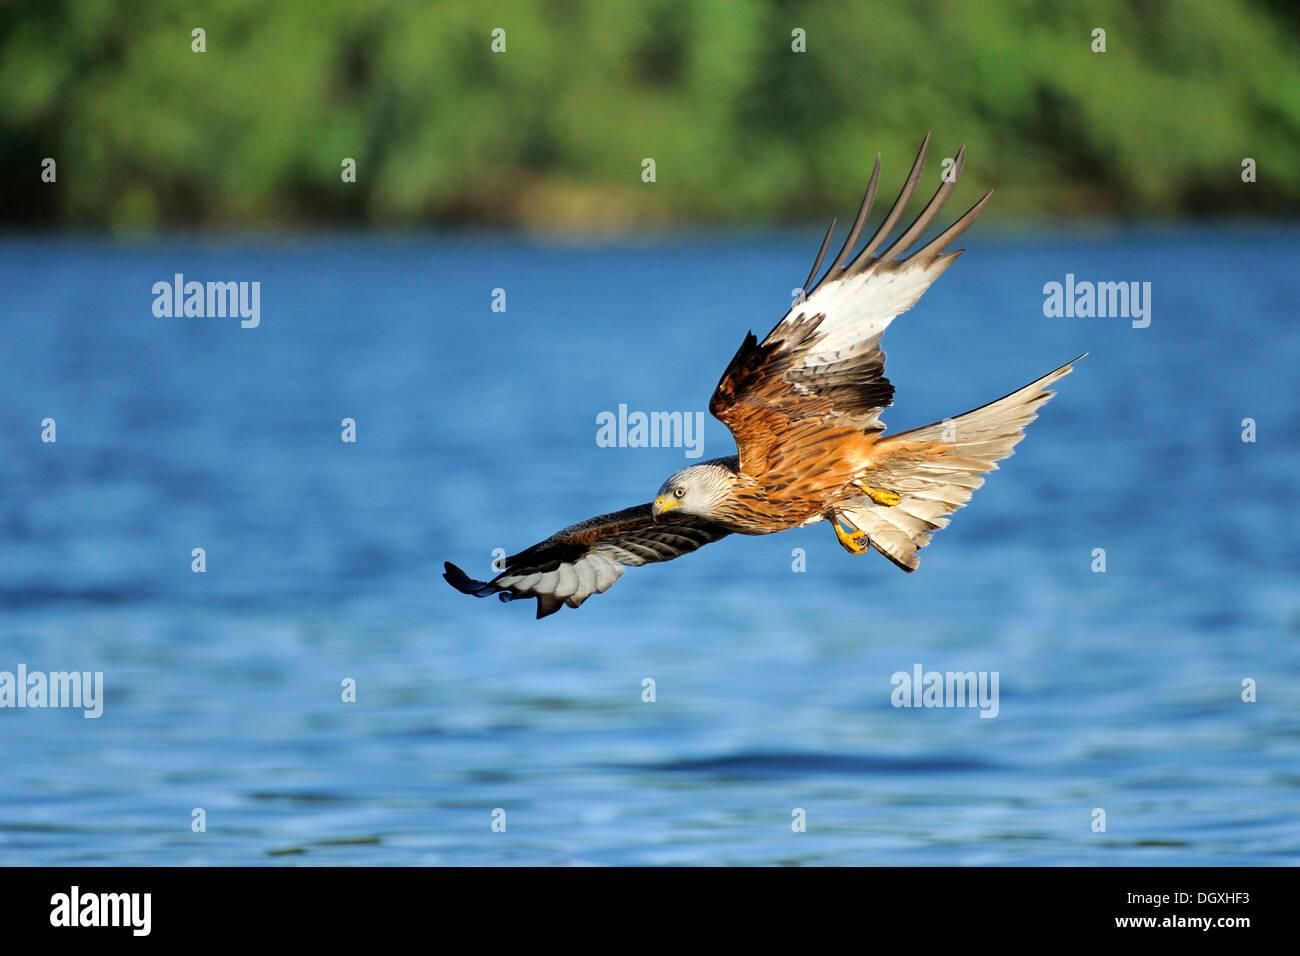 Red Kite (Milvus milvus), during approach, Schmaler Luzin lake, Feldberg, Mecklenburg-Western Pomerania - Stock Image